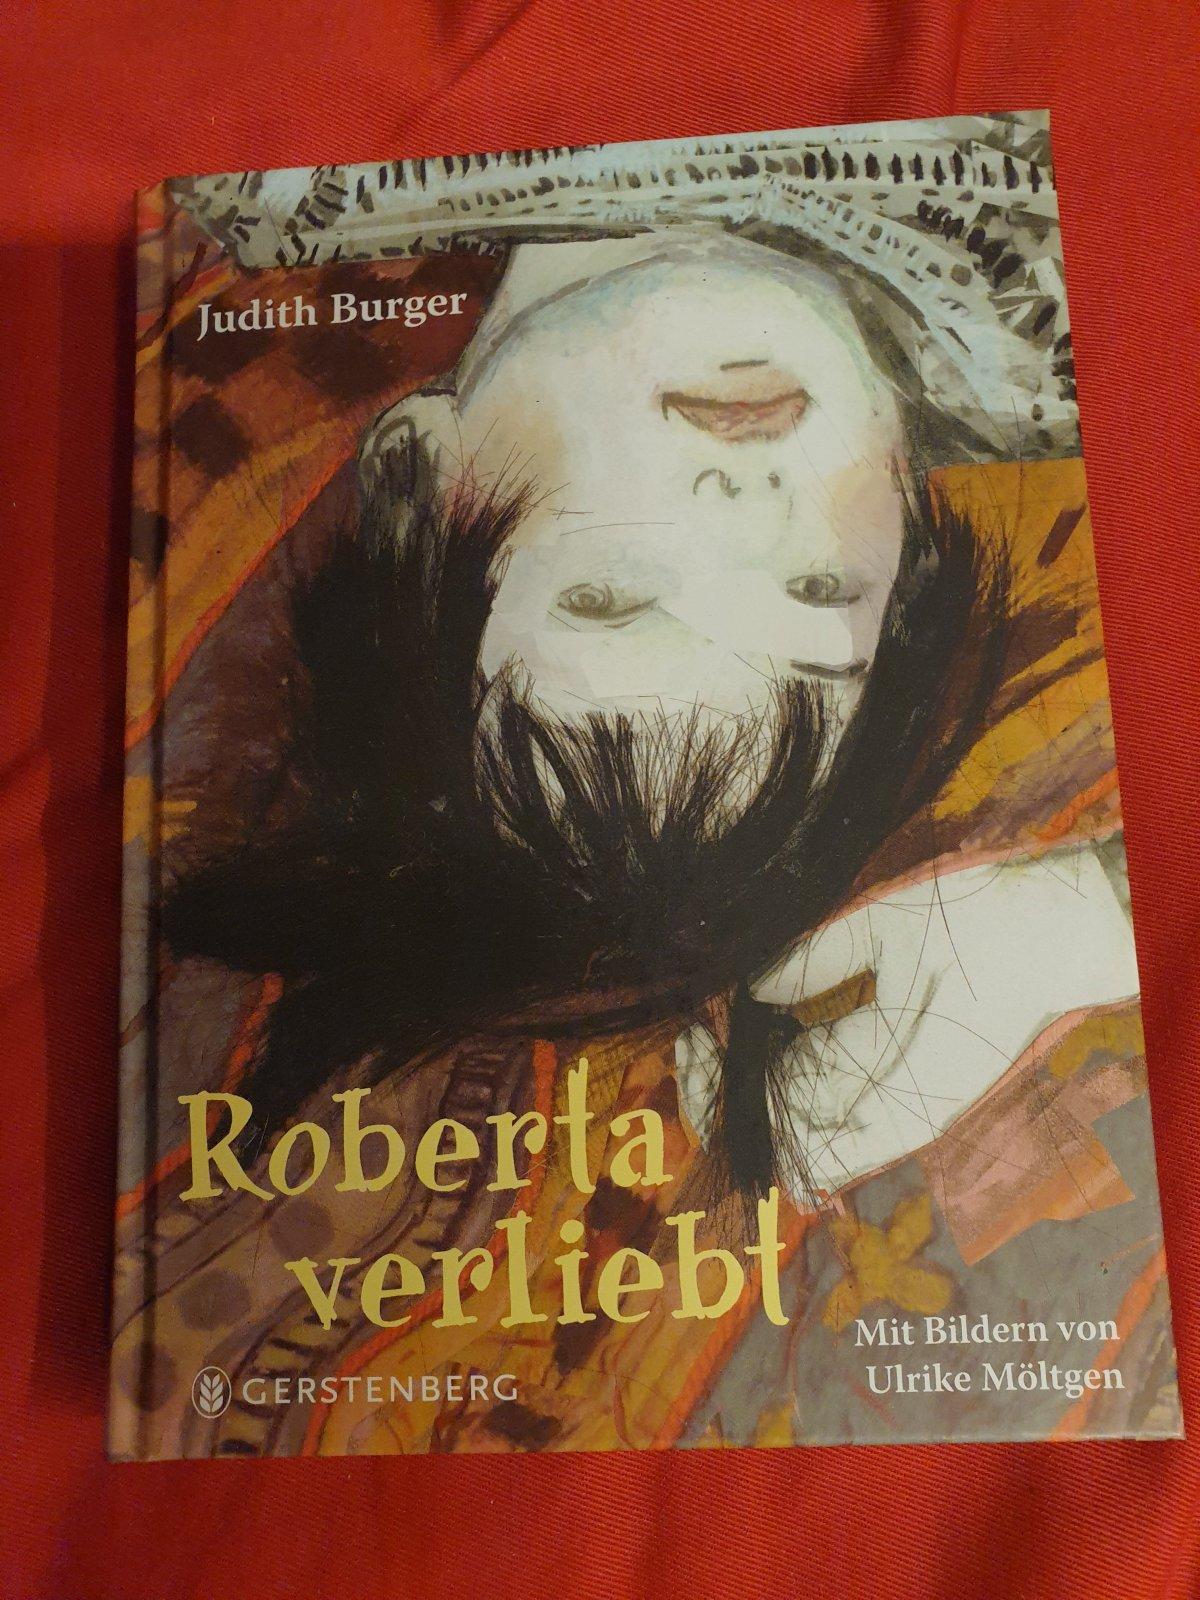 Tag 38 – Robertaverliebt